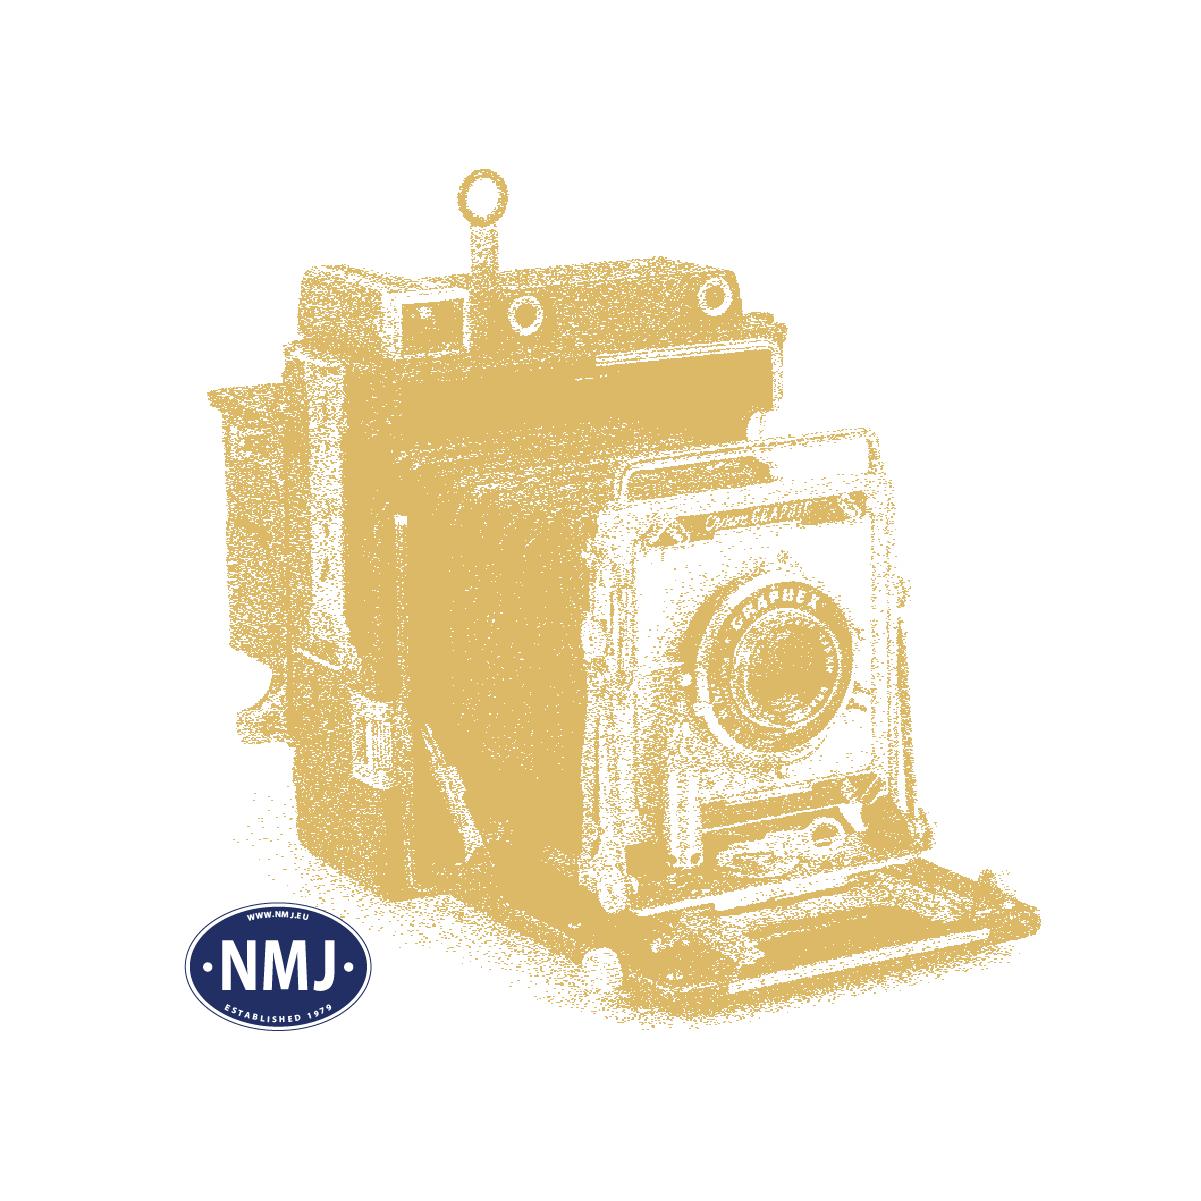 NMJT90209 - NMJ Topline MAV M61.007, DCC w/ Sound